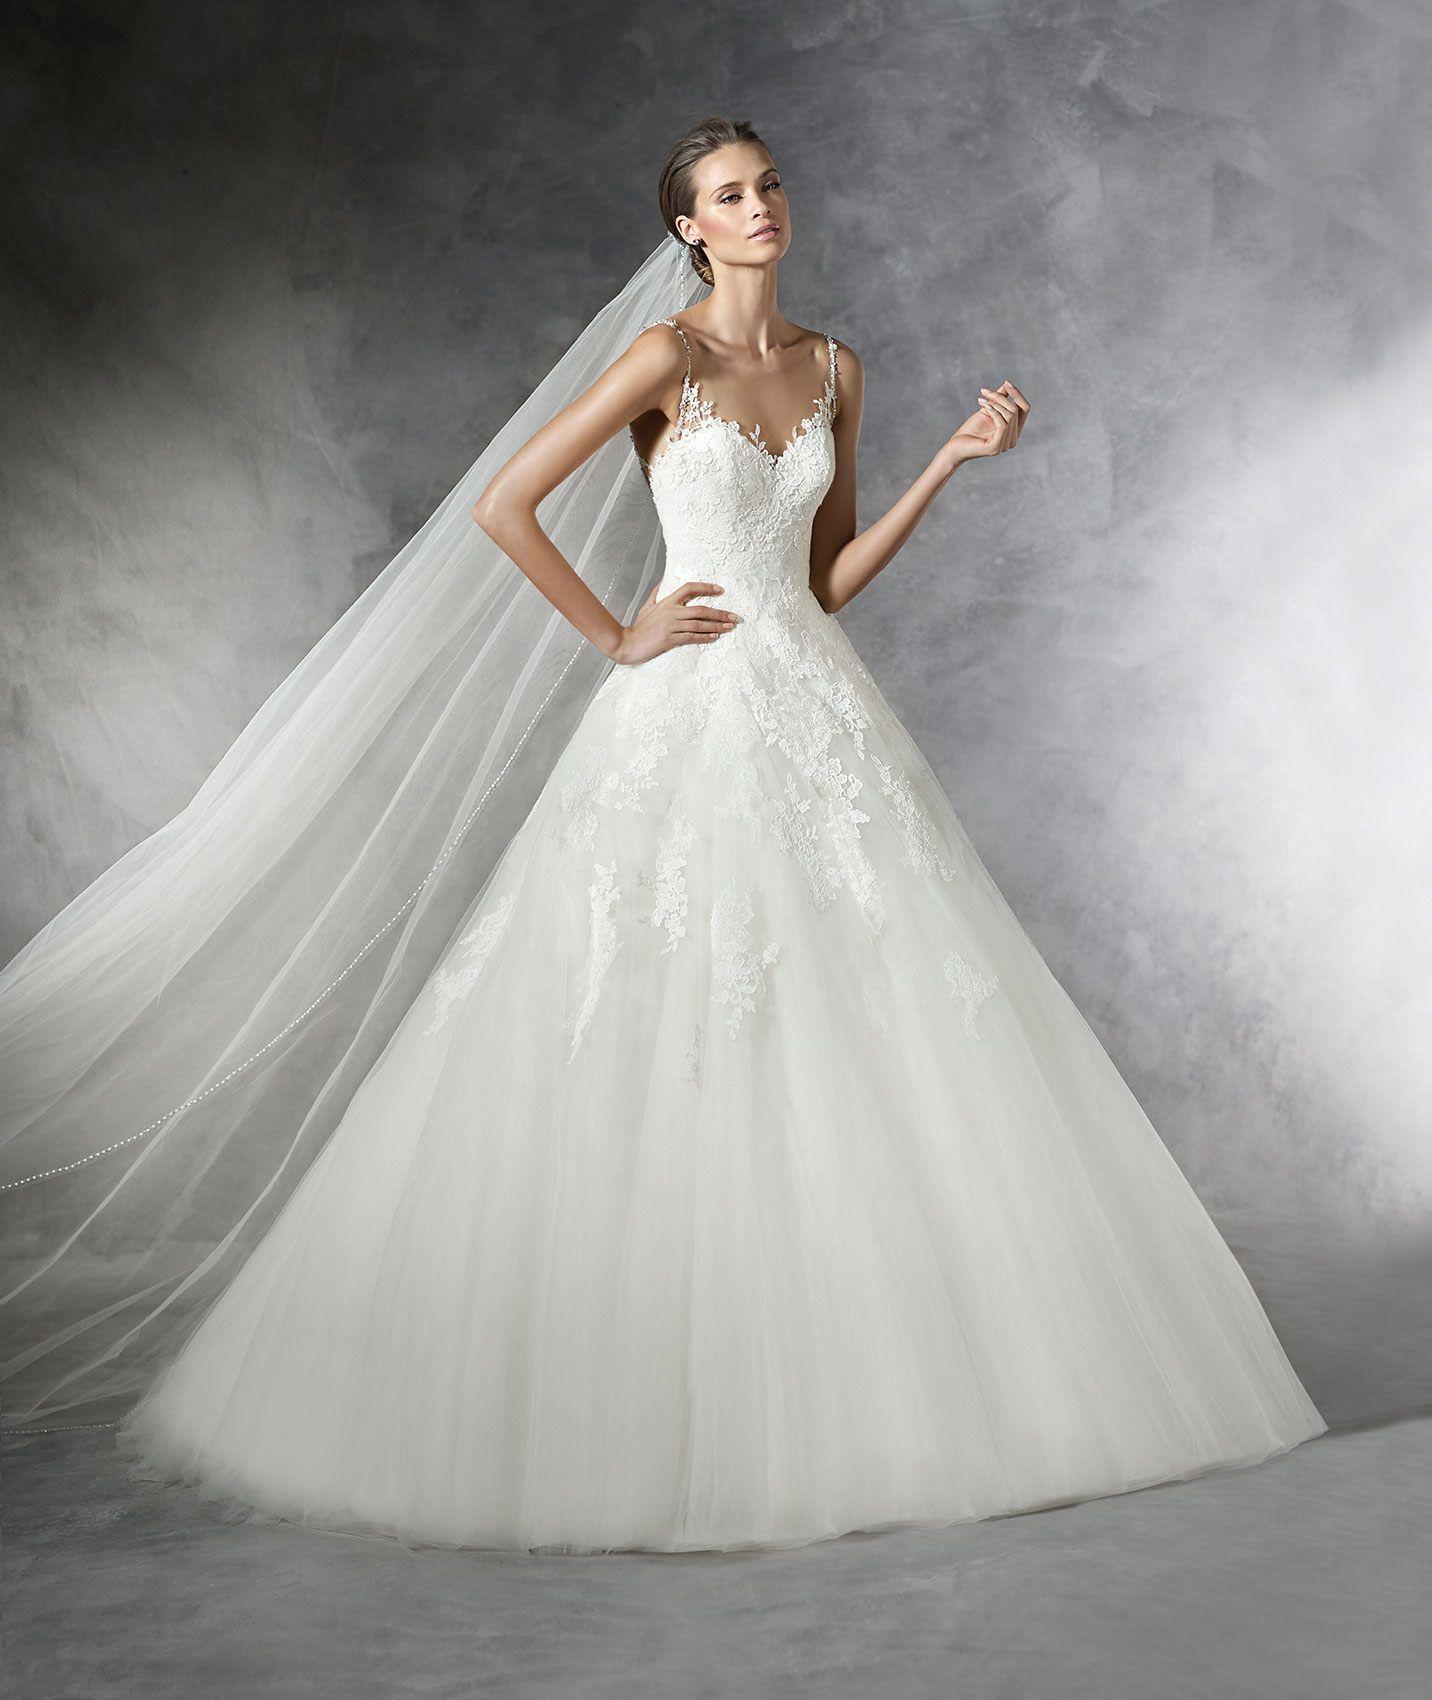 Preloved pronovias wedding dresses   mmonsaj on Pinterest